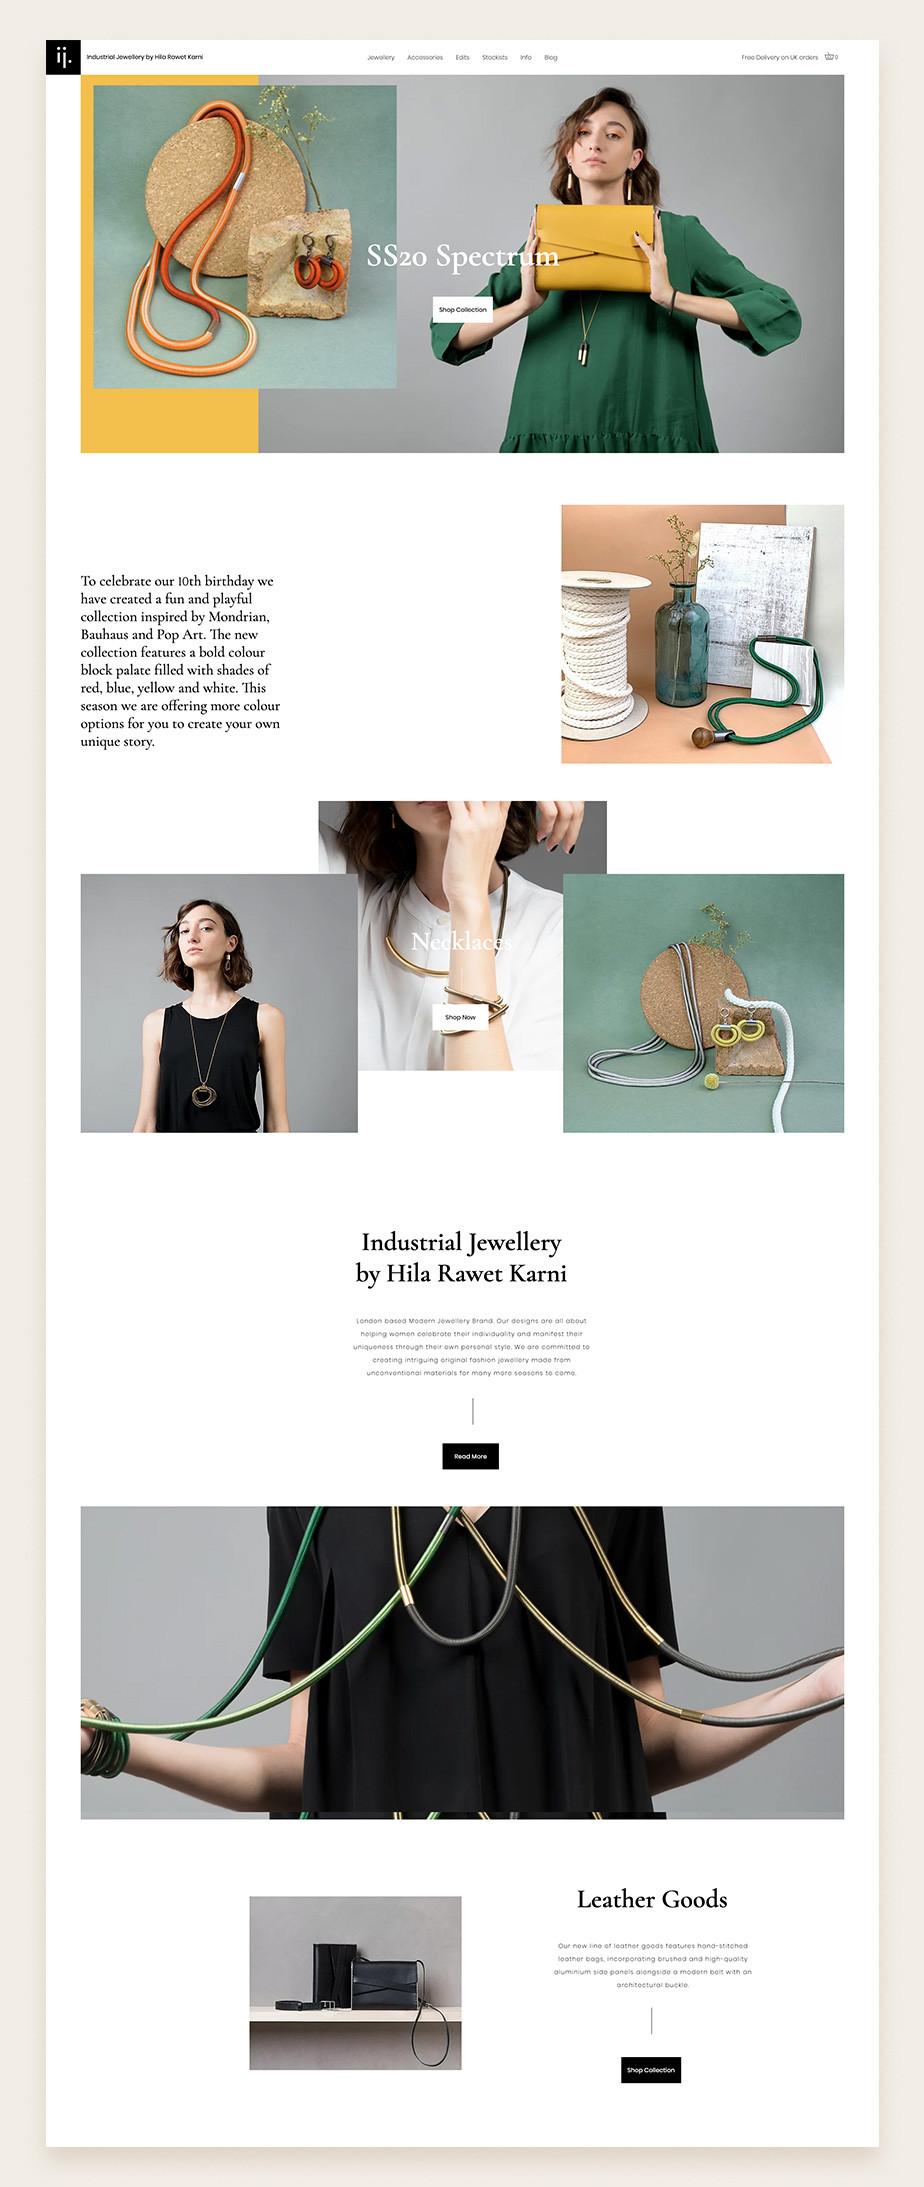 Wix website example by Hila Rawet Karni